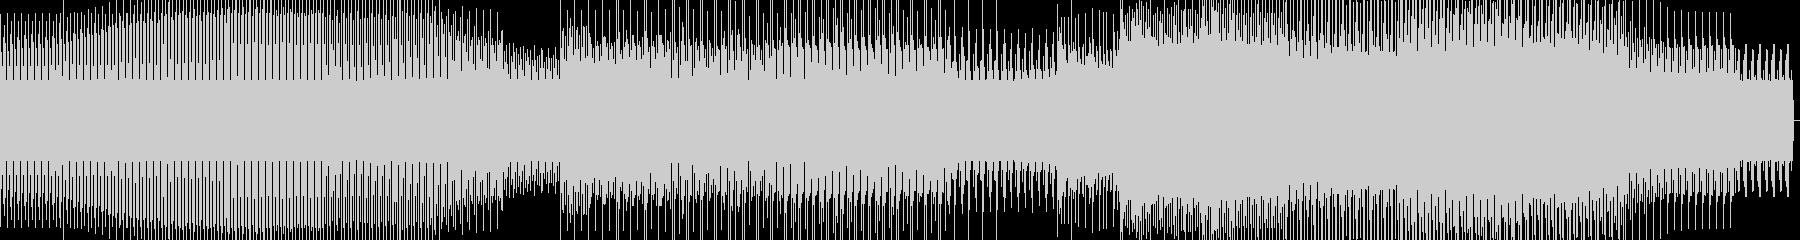 minimal hause 40 の未再生の波形